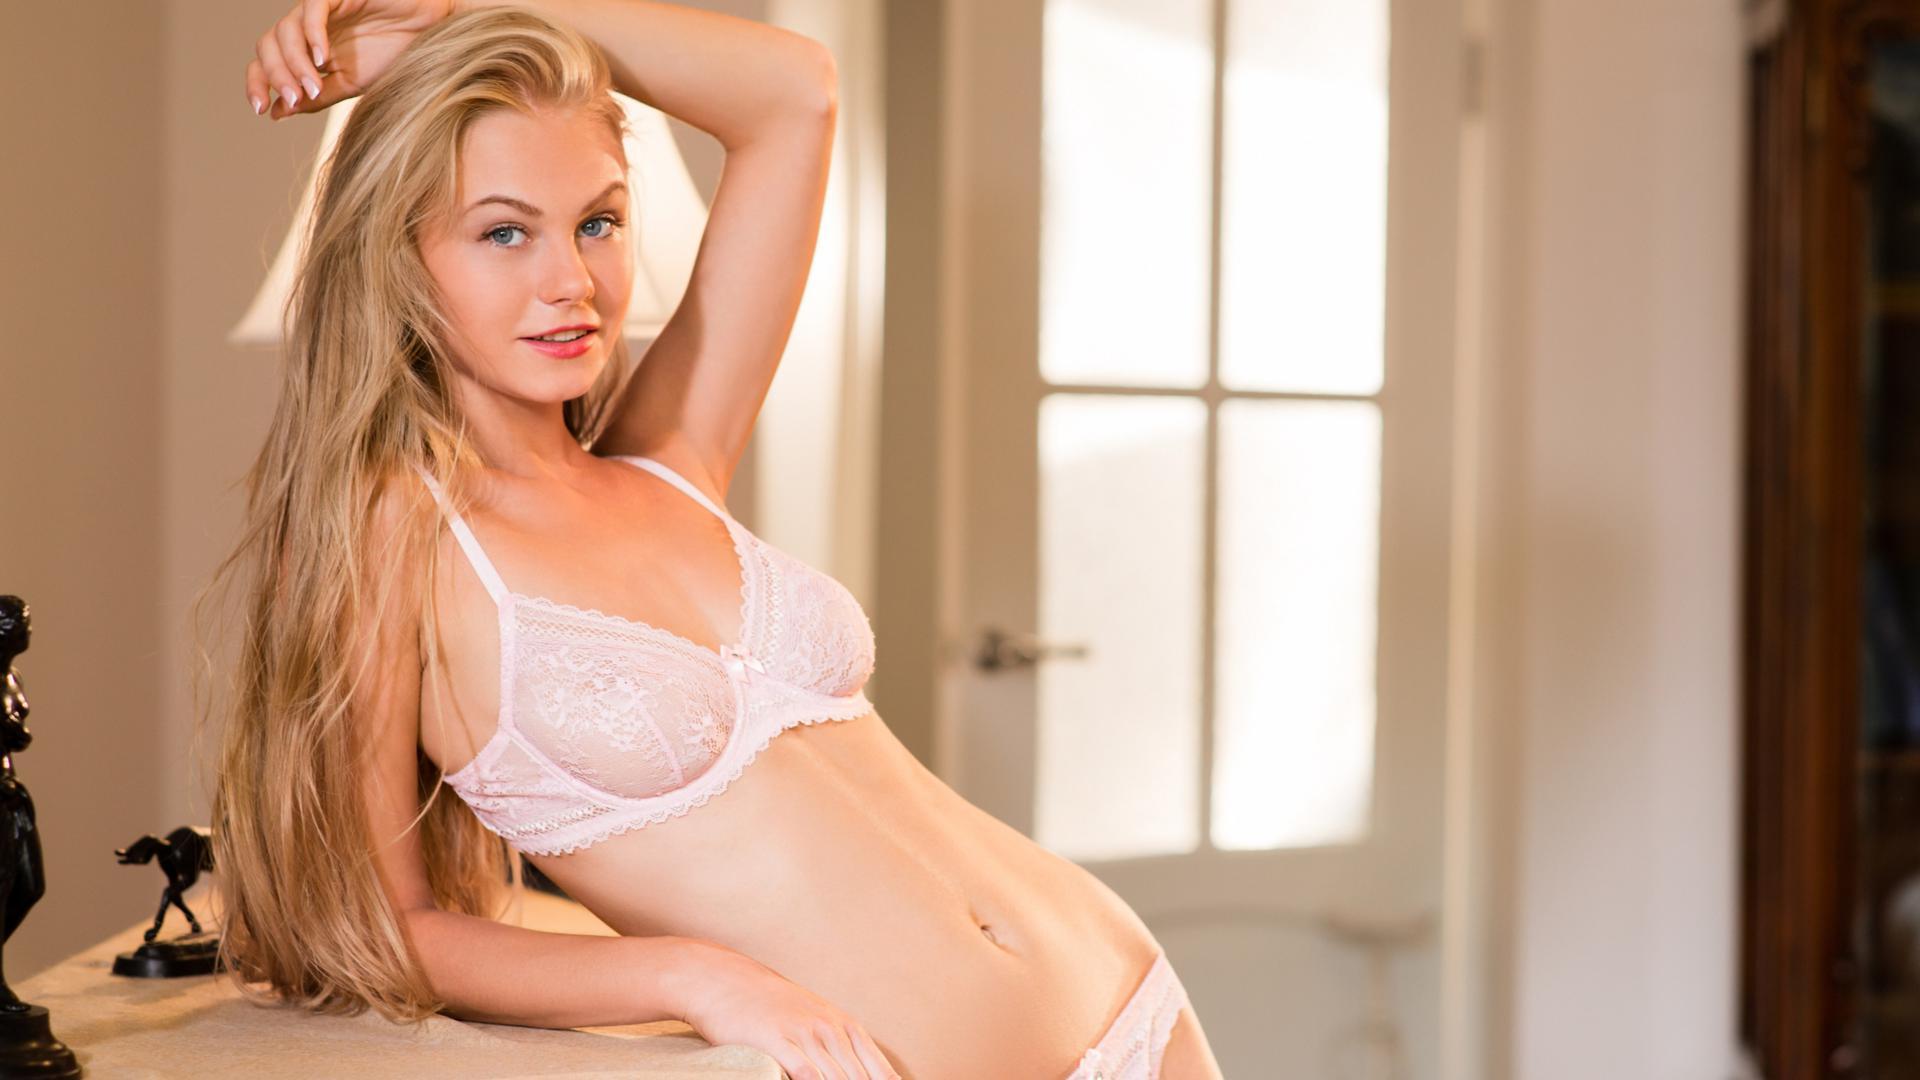 Download photo 1920x1080, nancy a, blonde, sexy girl